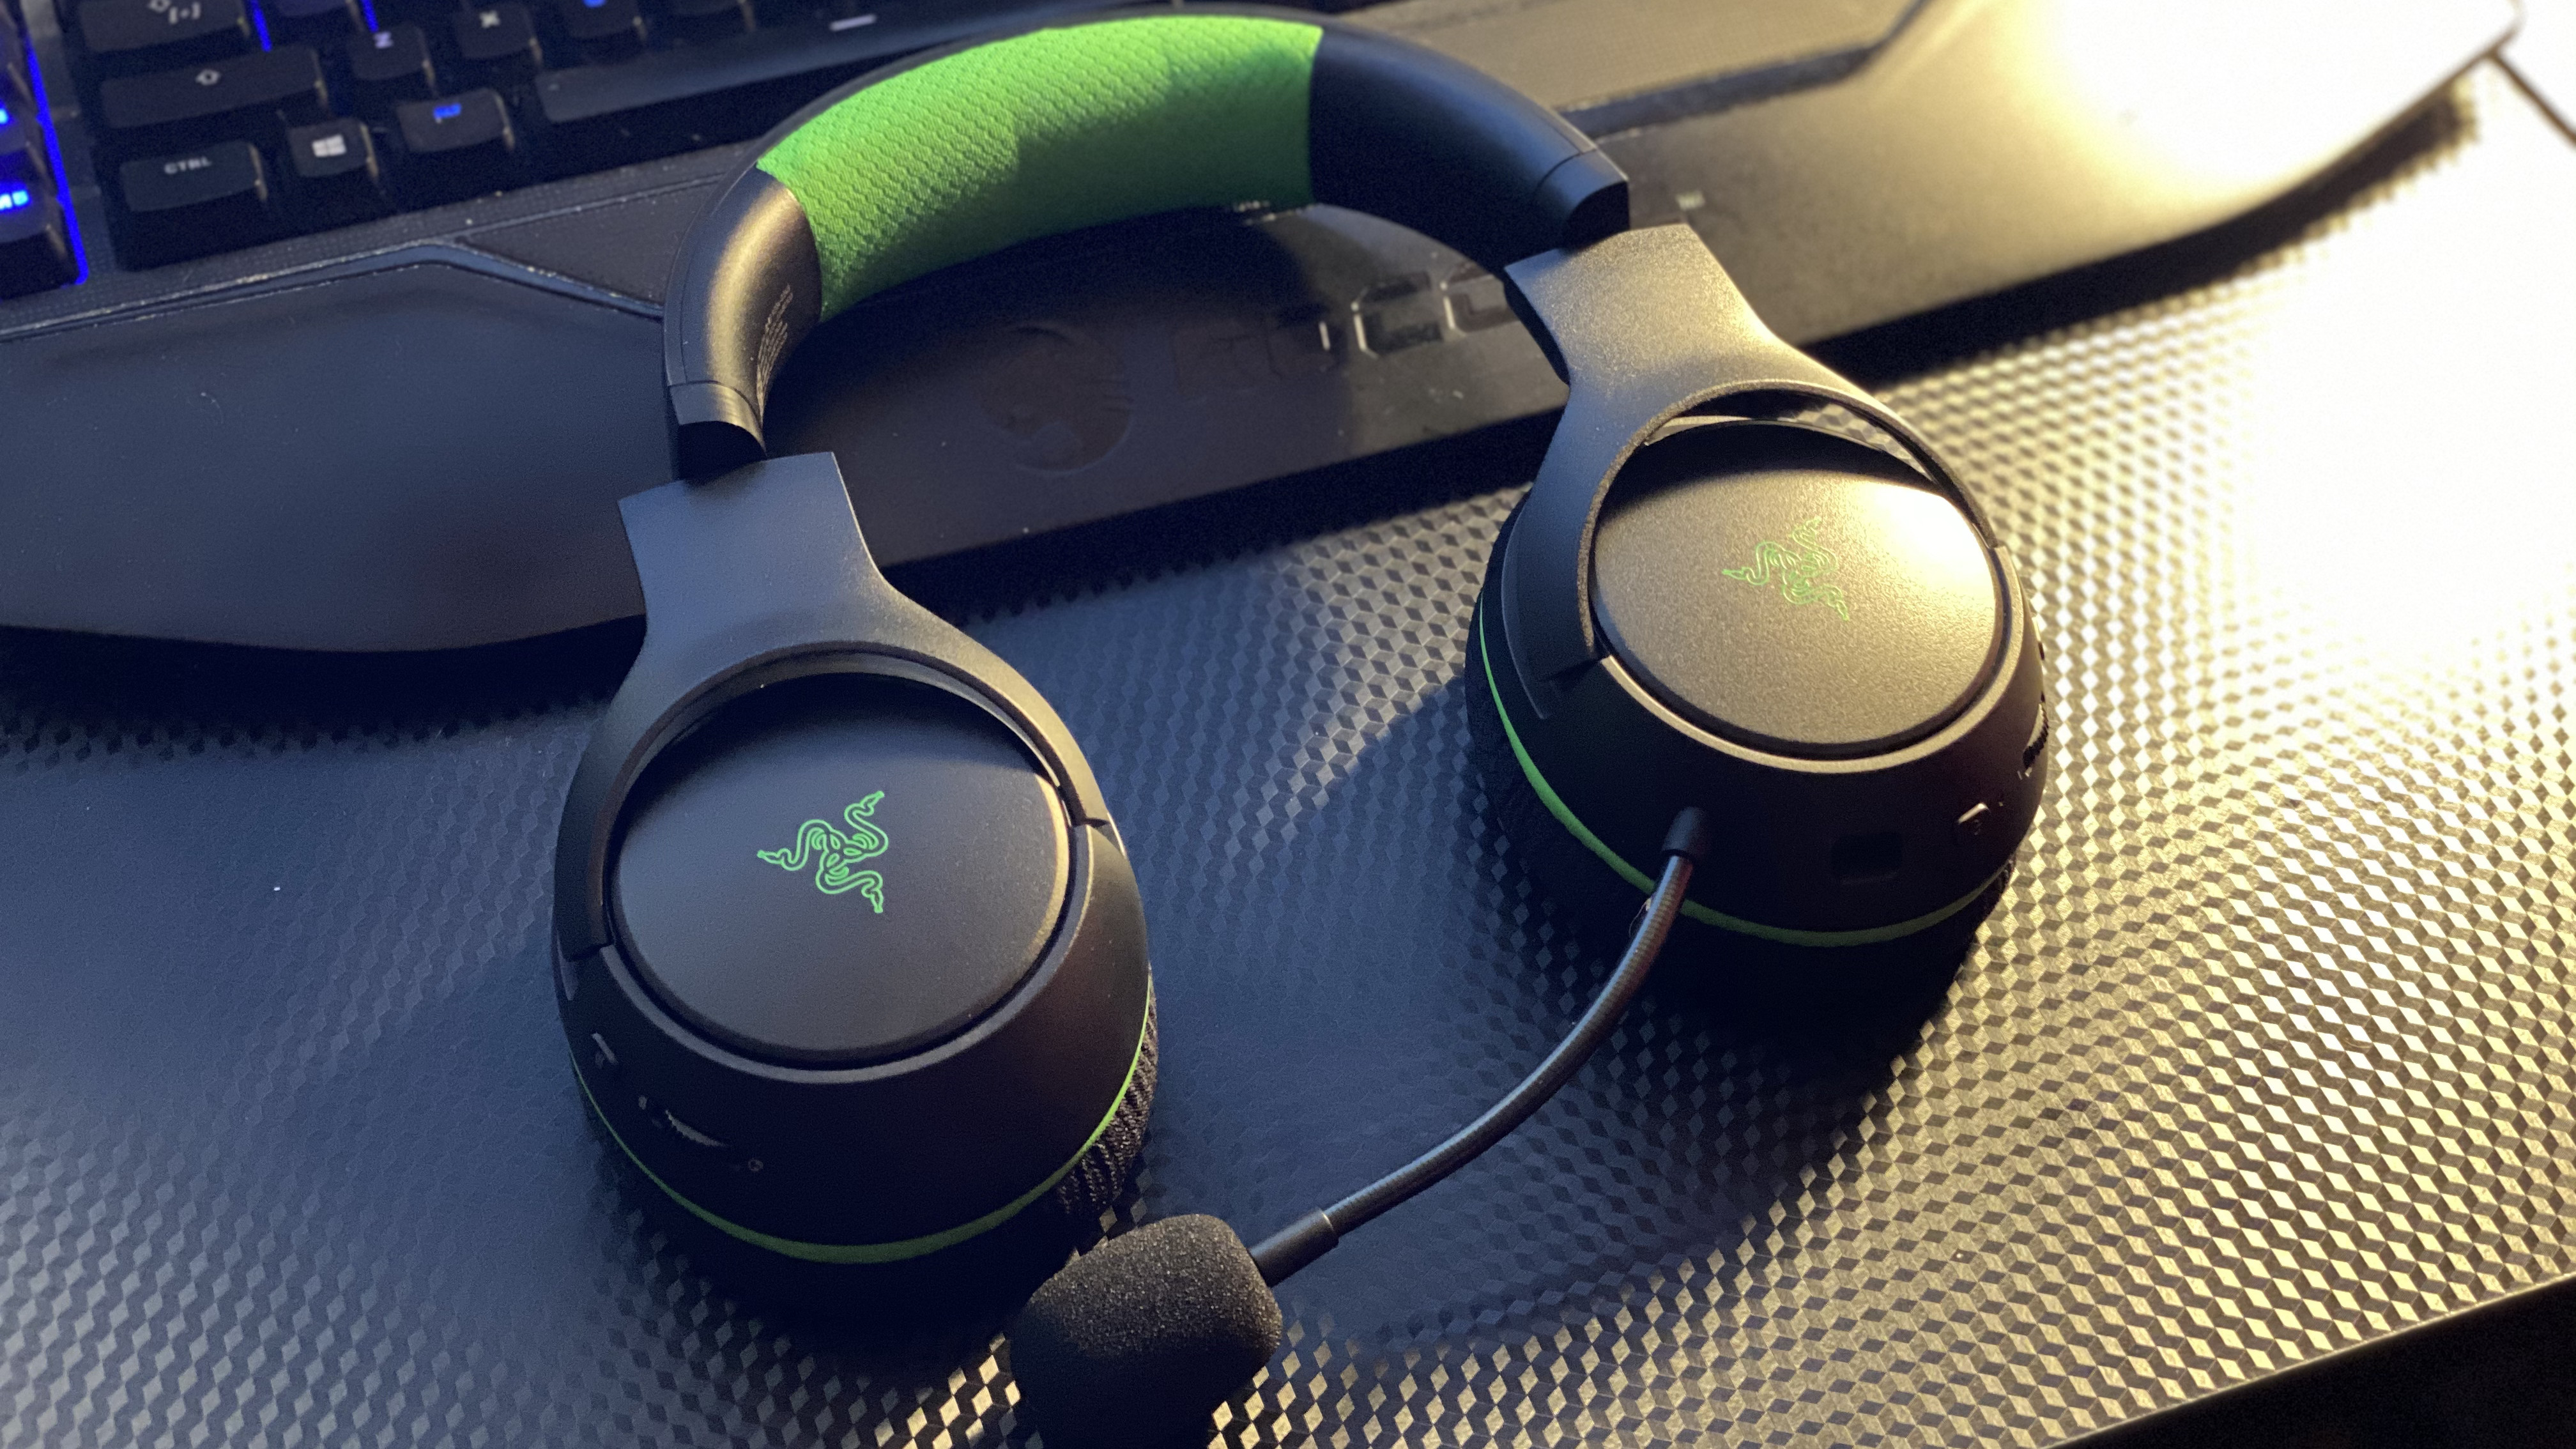 Razer Kaira and Kaira Pro for Xbox